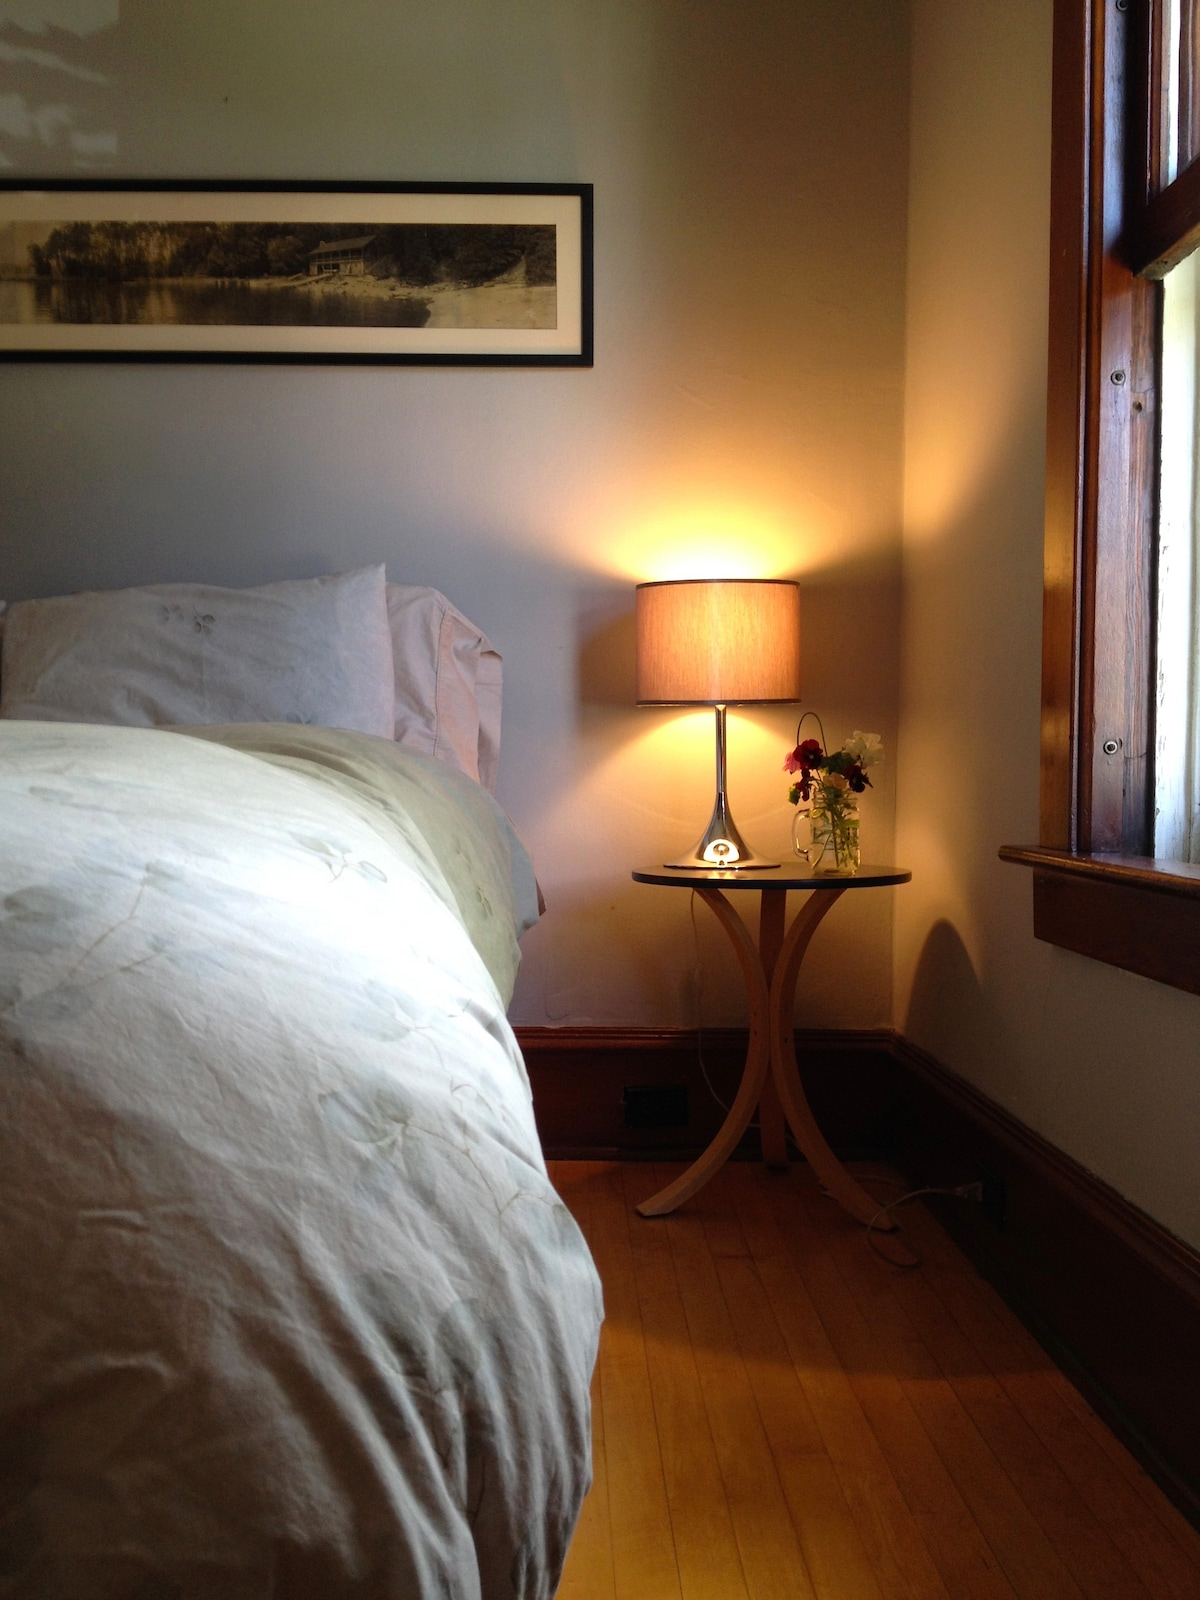 Detail of your bedroom